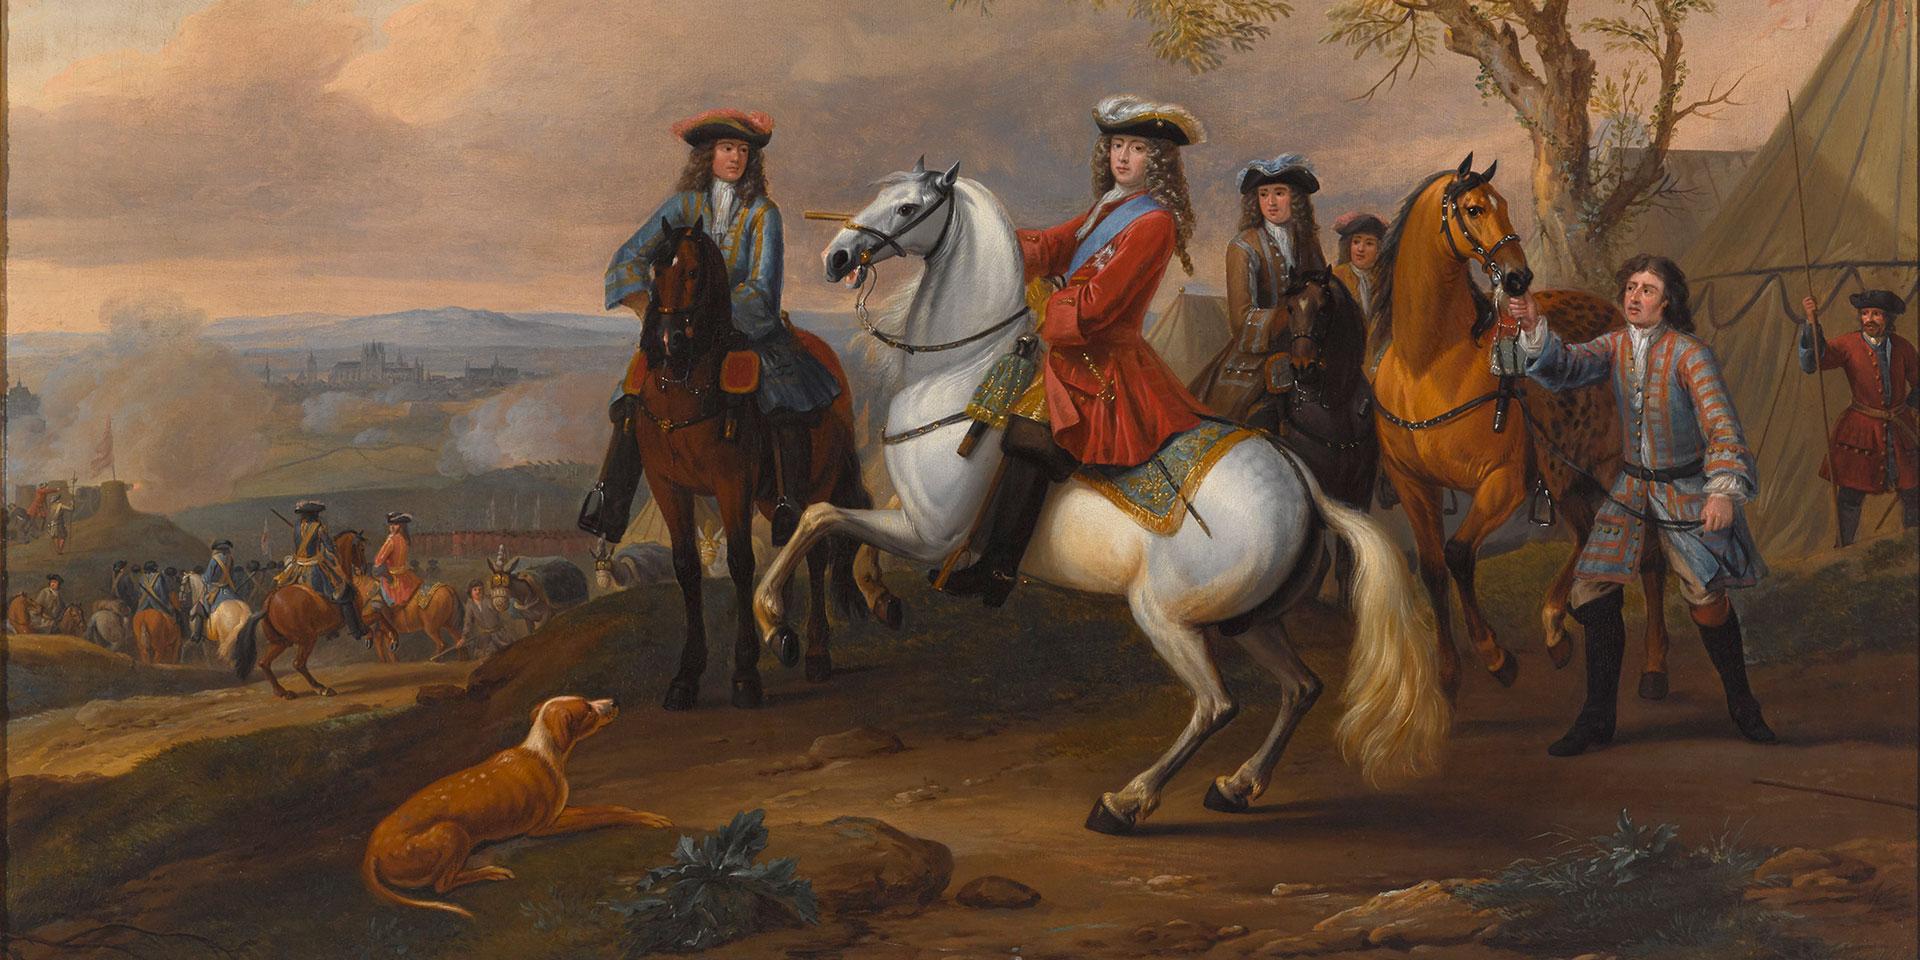 The Duke of Marlborough at the Siege of Tournai, 1709